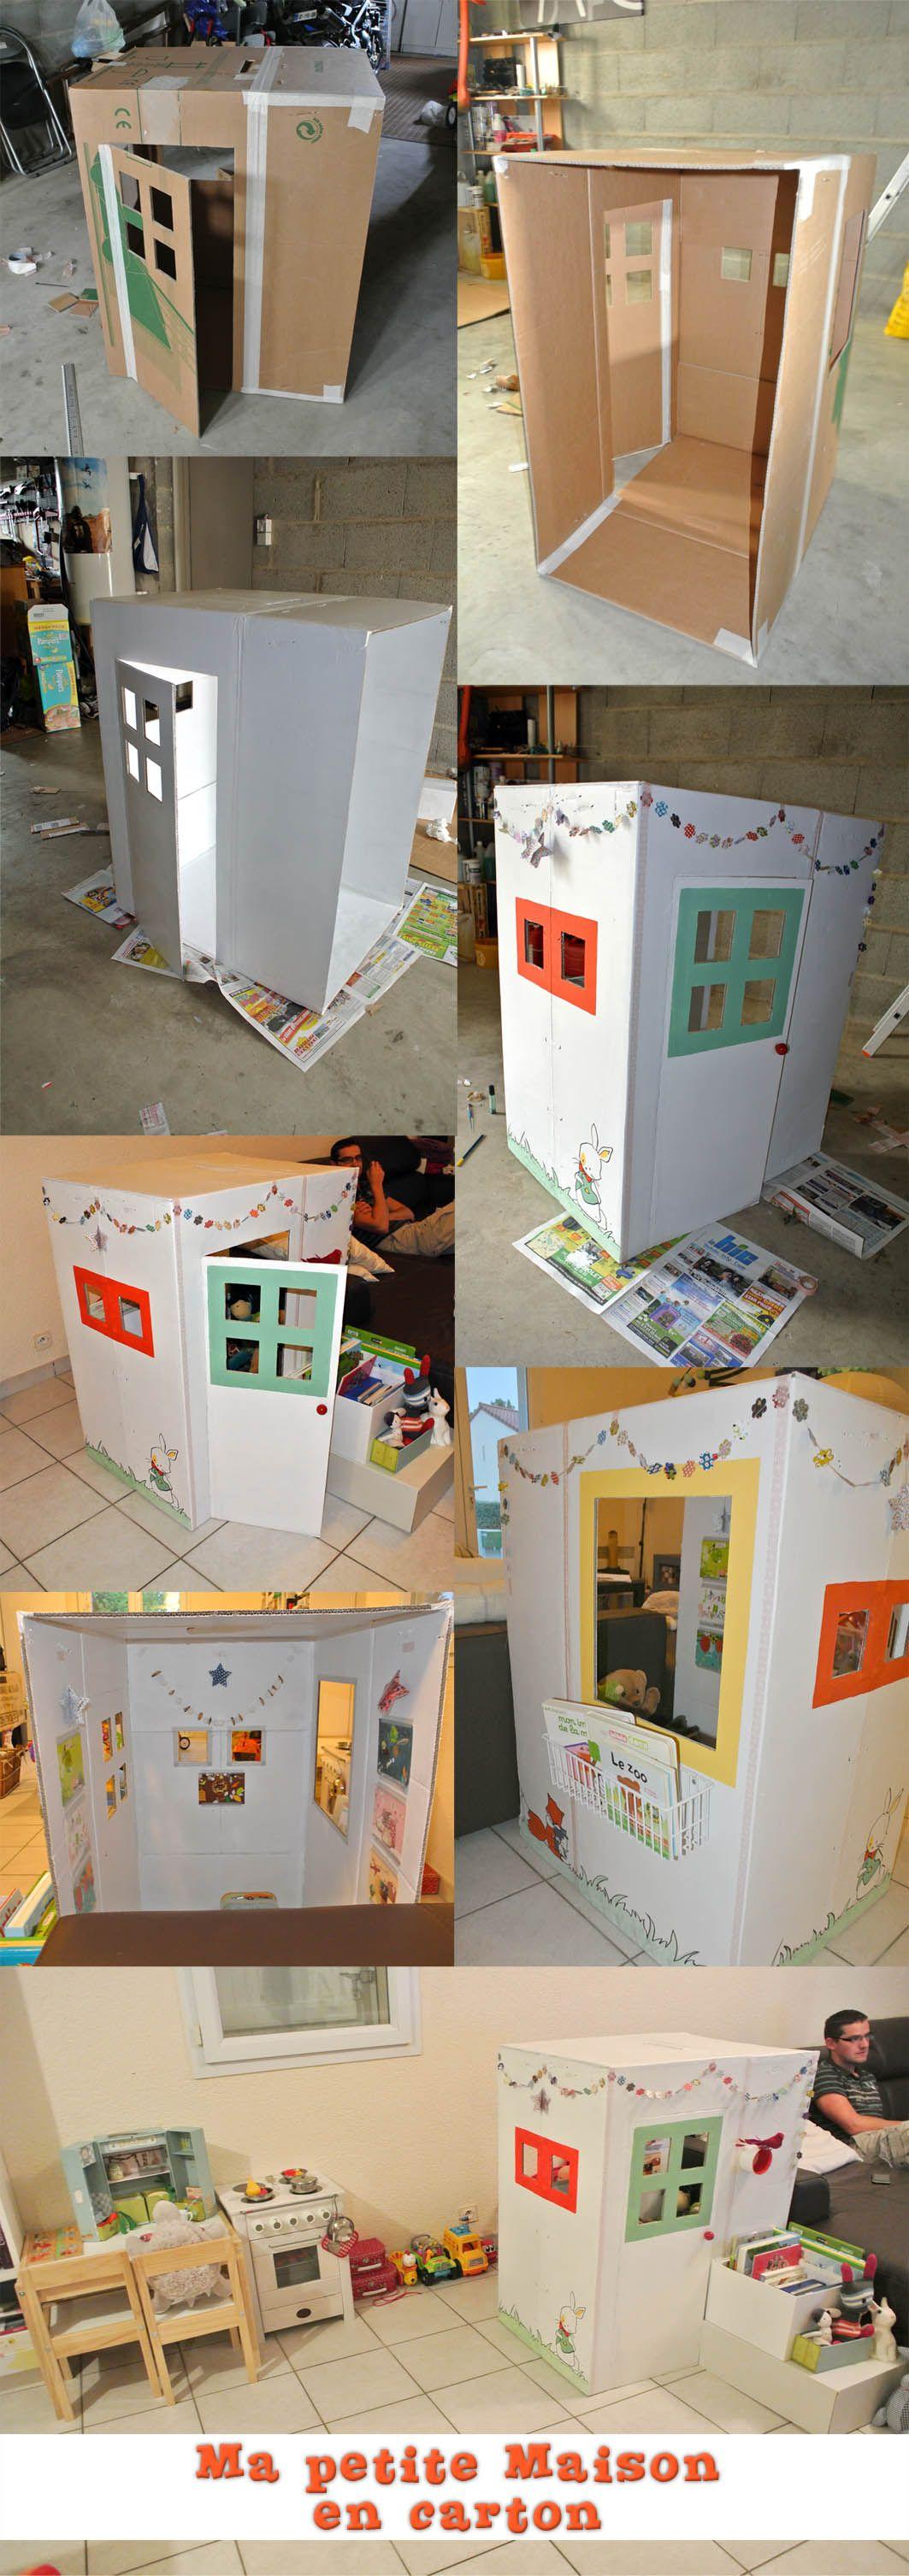 spielhaus aus pappe basteln pinterest spielhaus. Black Bedroom Furniture Sets. Home Design Ideas